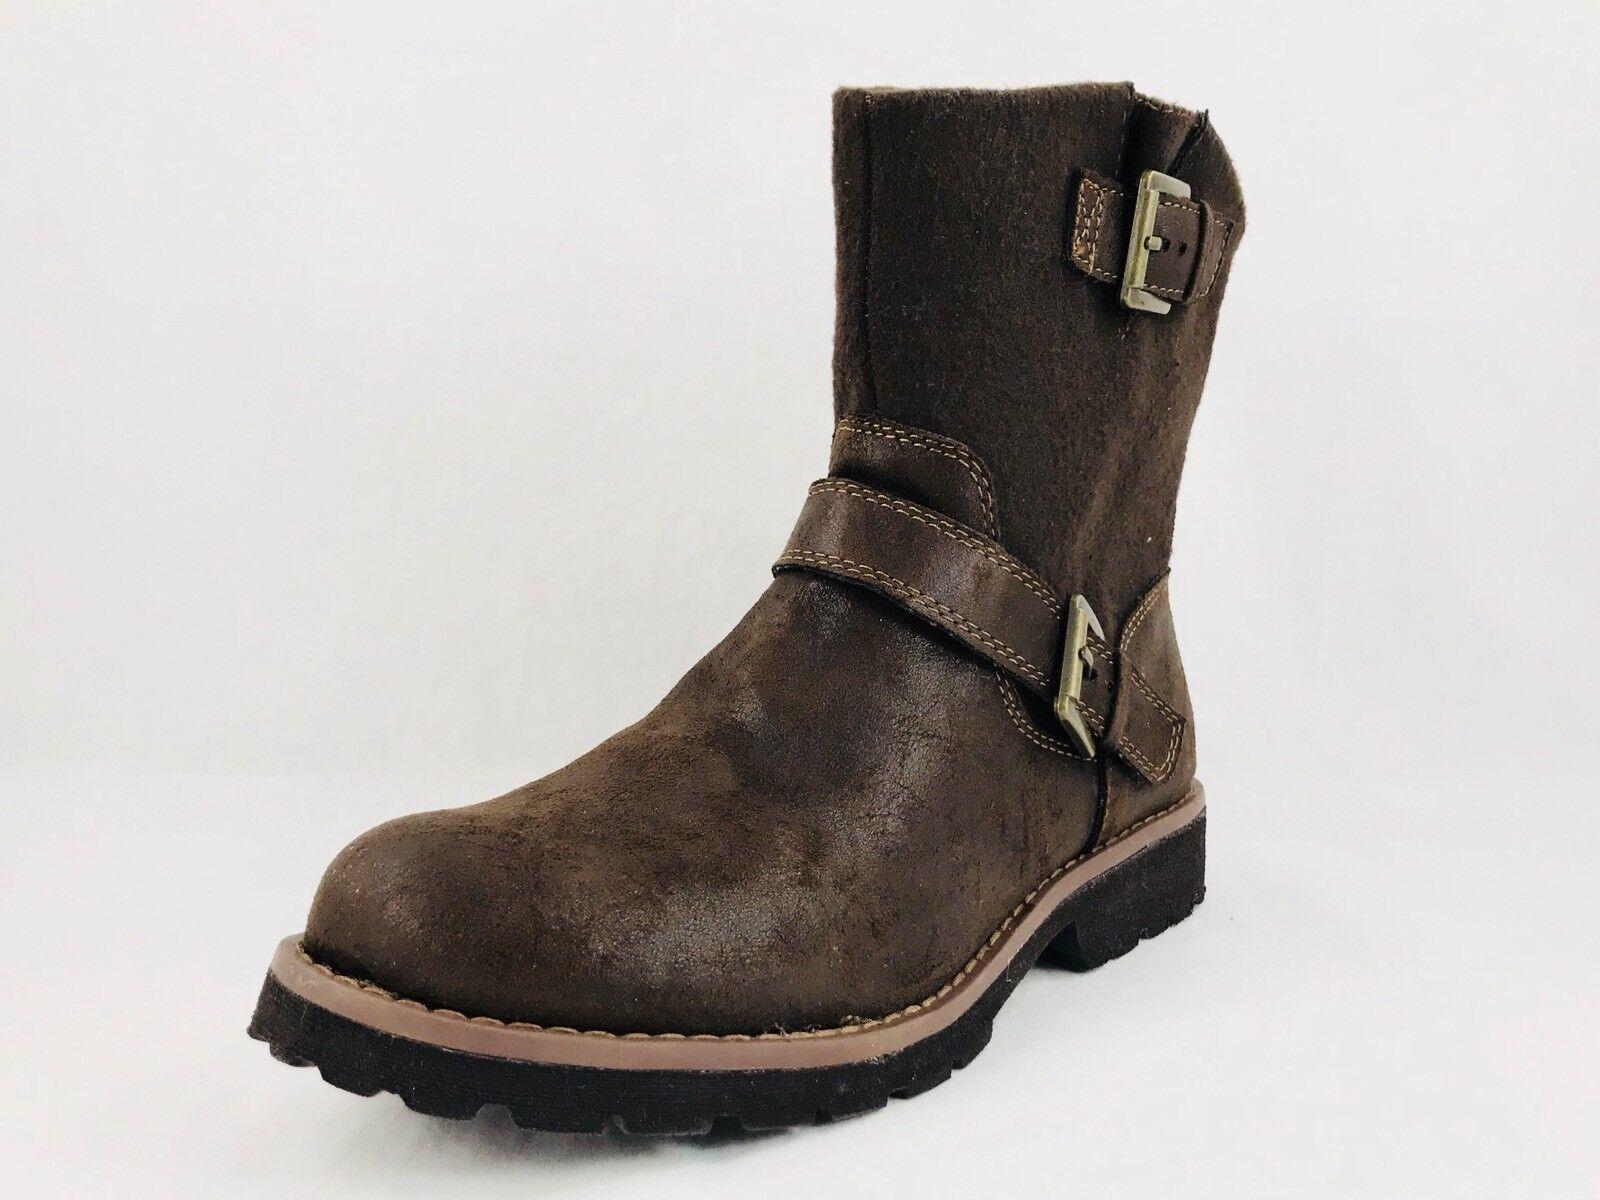 Born Concepts B.O.C. Volos Side Zip Braun Fabric Boot Damenschuhe Sz 8.5